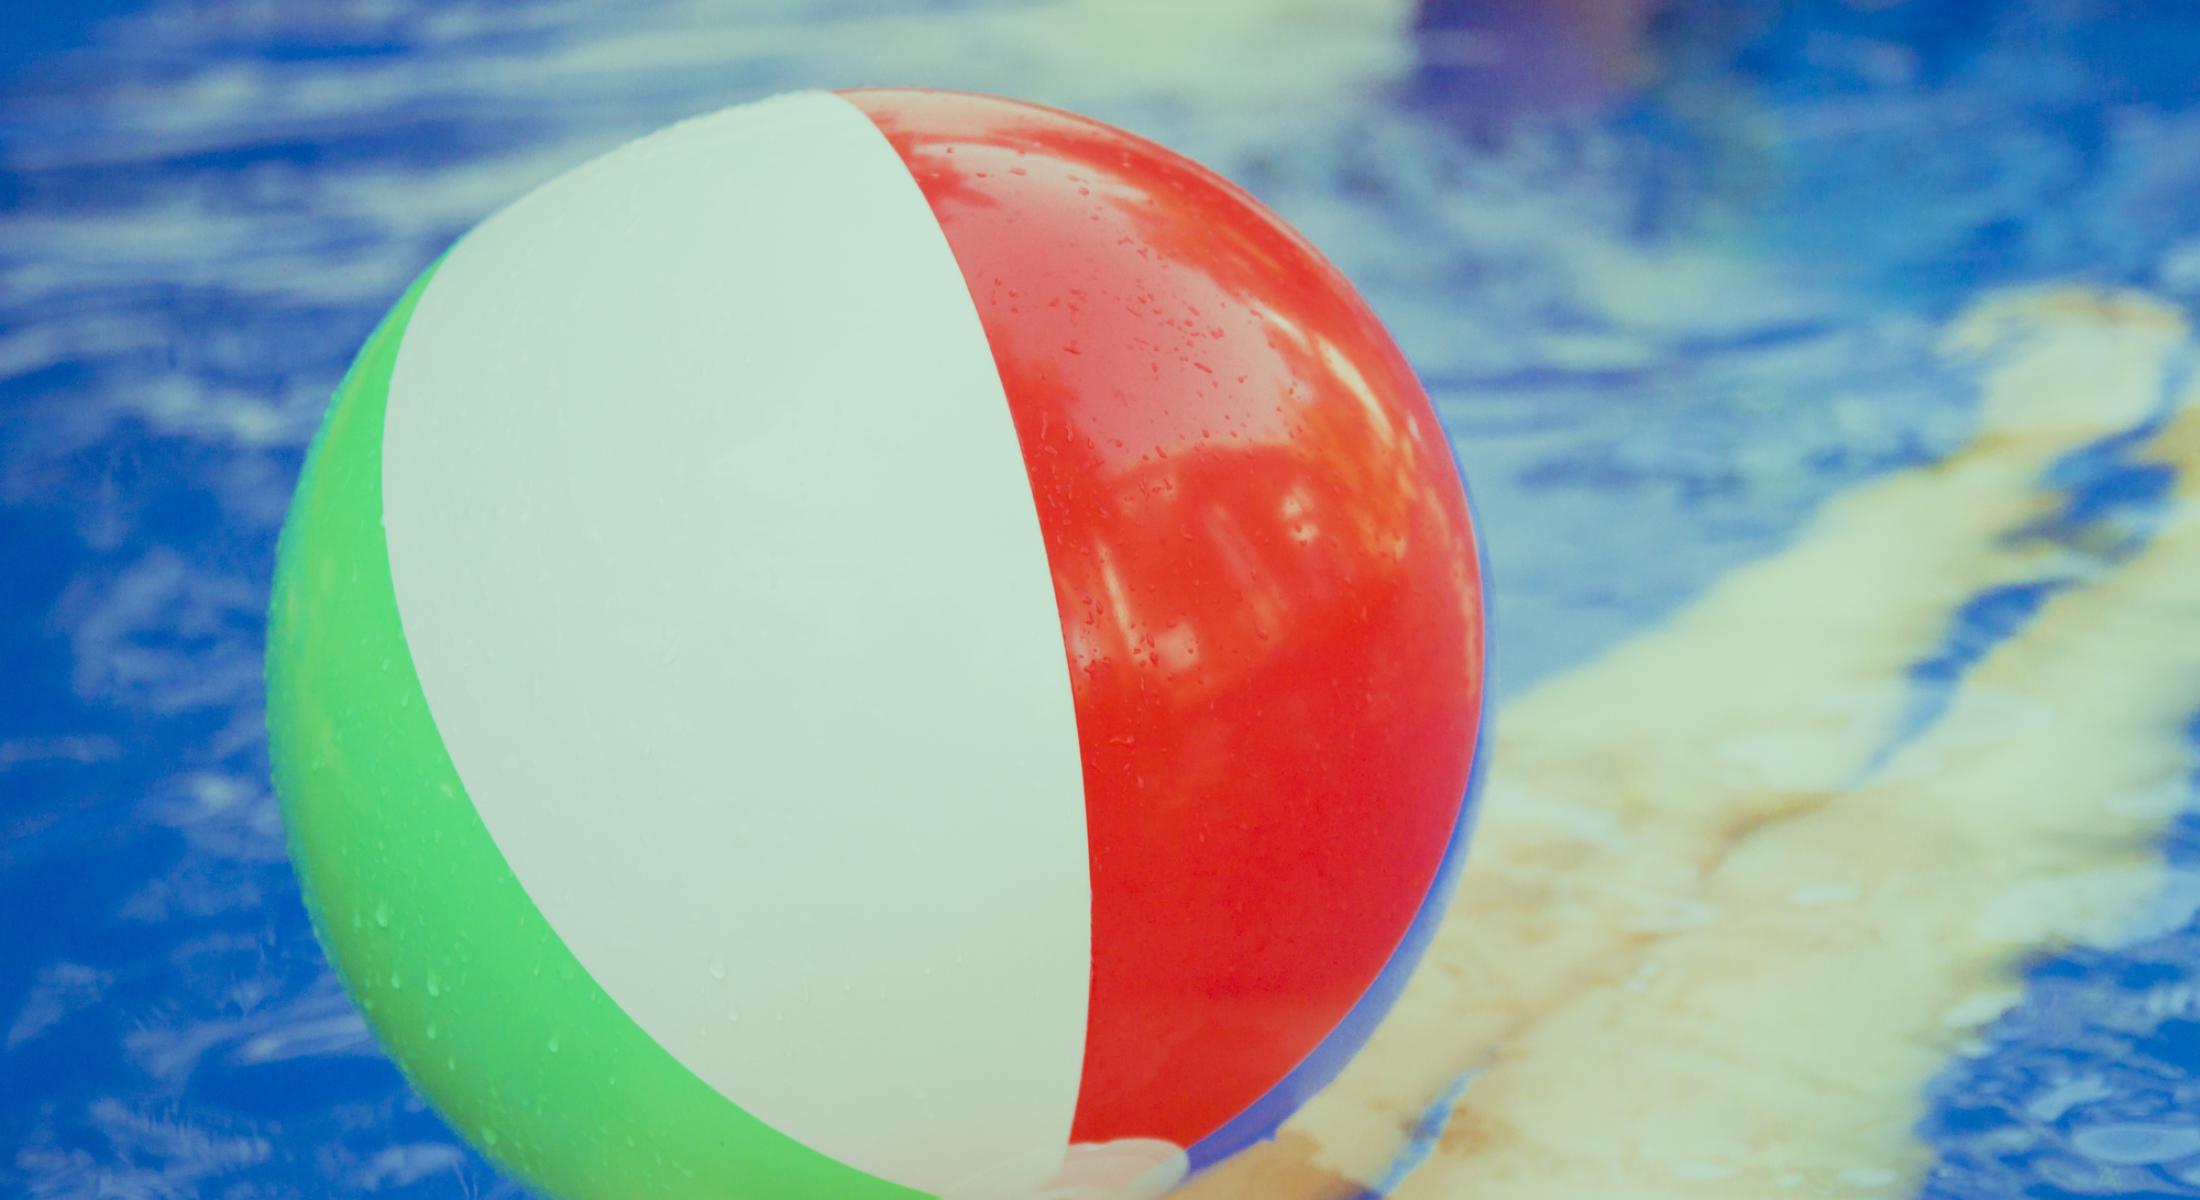 15 Fun Pool Games for Everyone